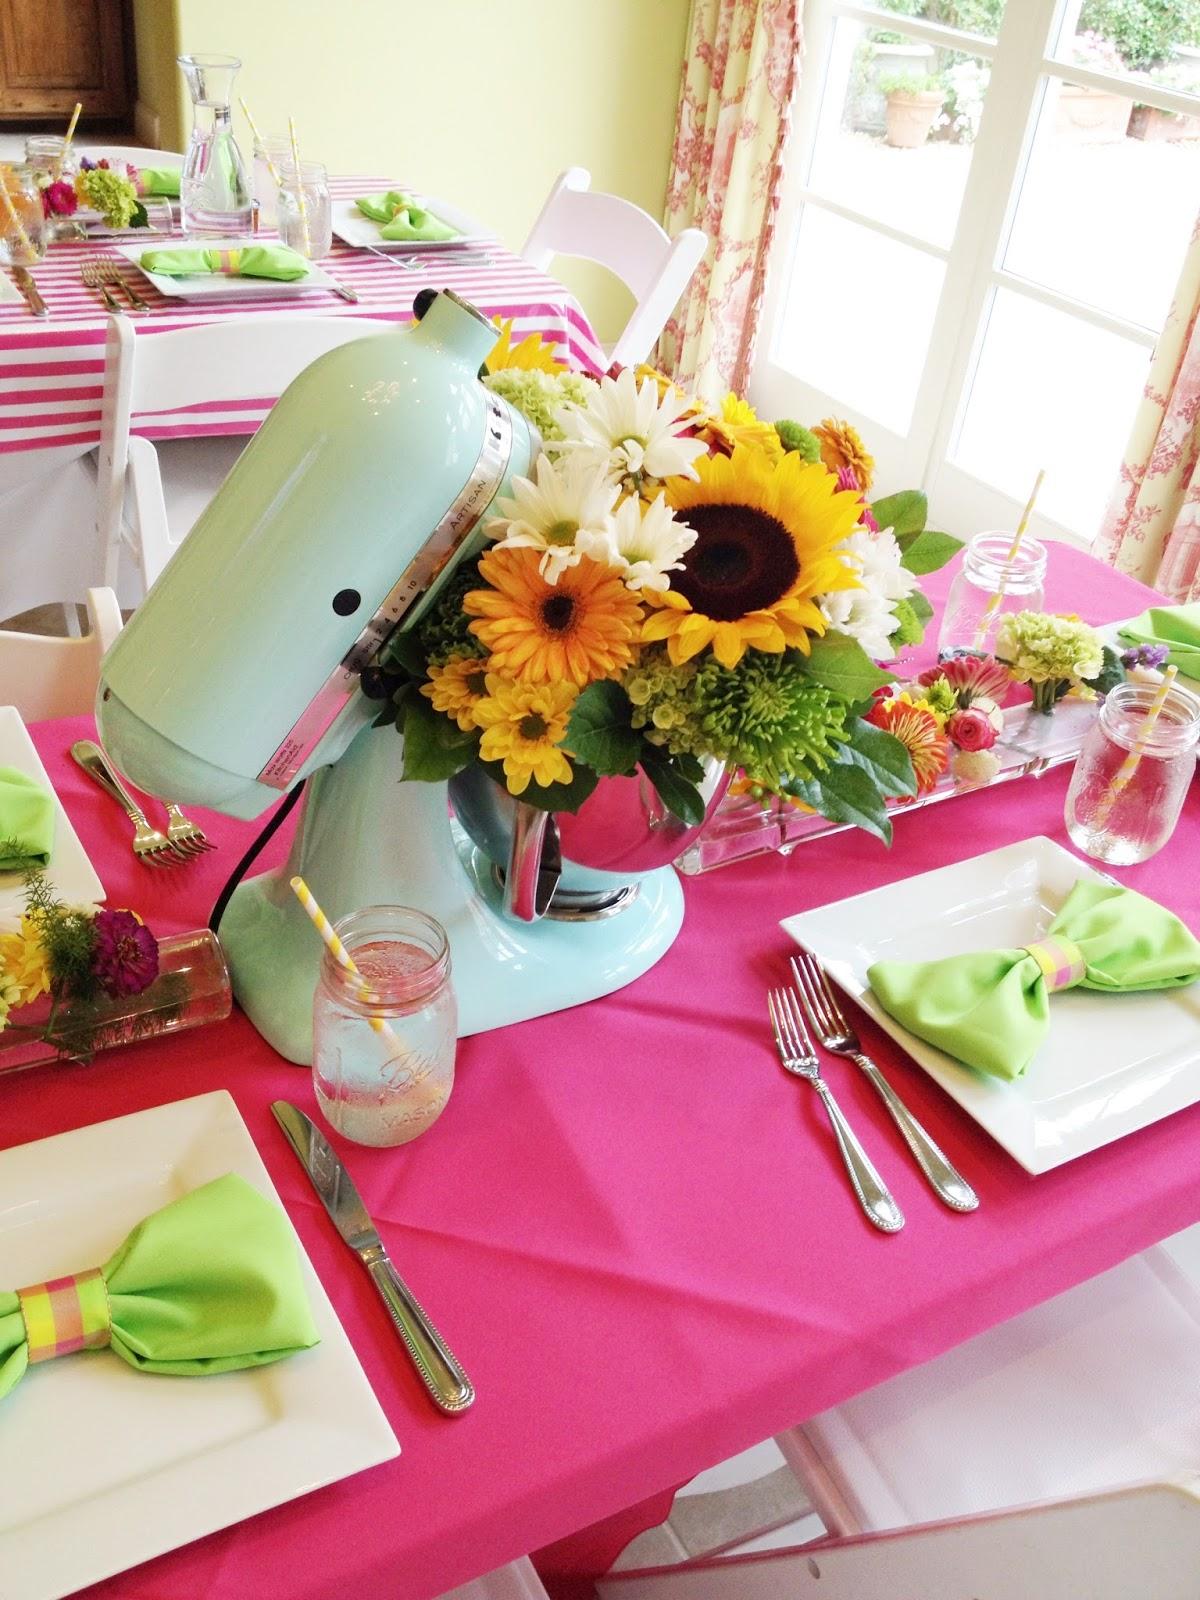 DIY Kitchen Wedding Shower  My Life Well Loved